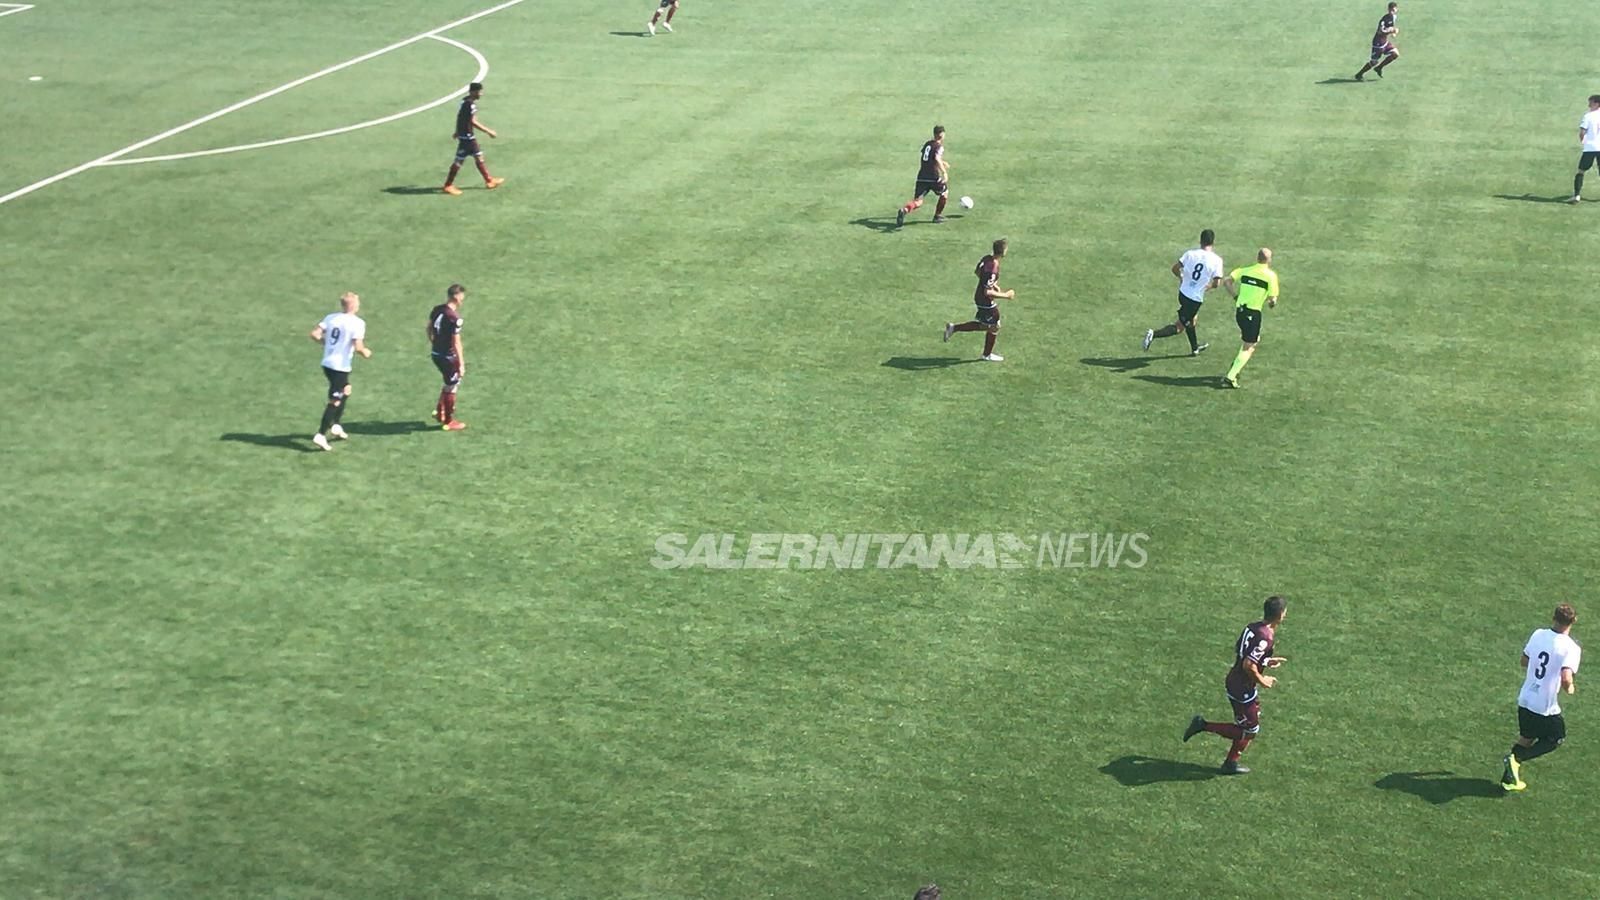 Spezia Salernitana Primavera 2 Girone A 2018 19 Giovanili